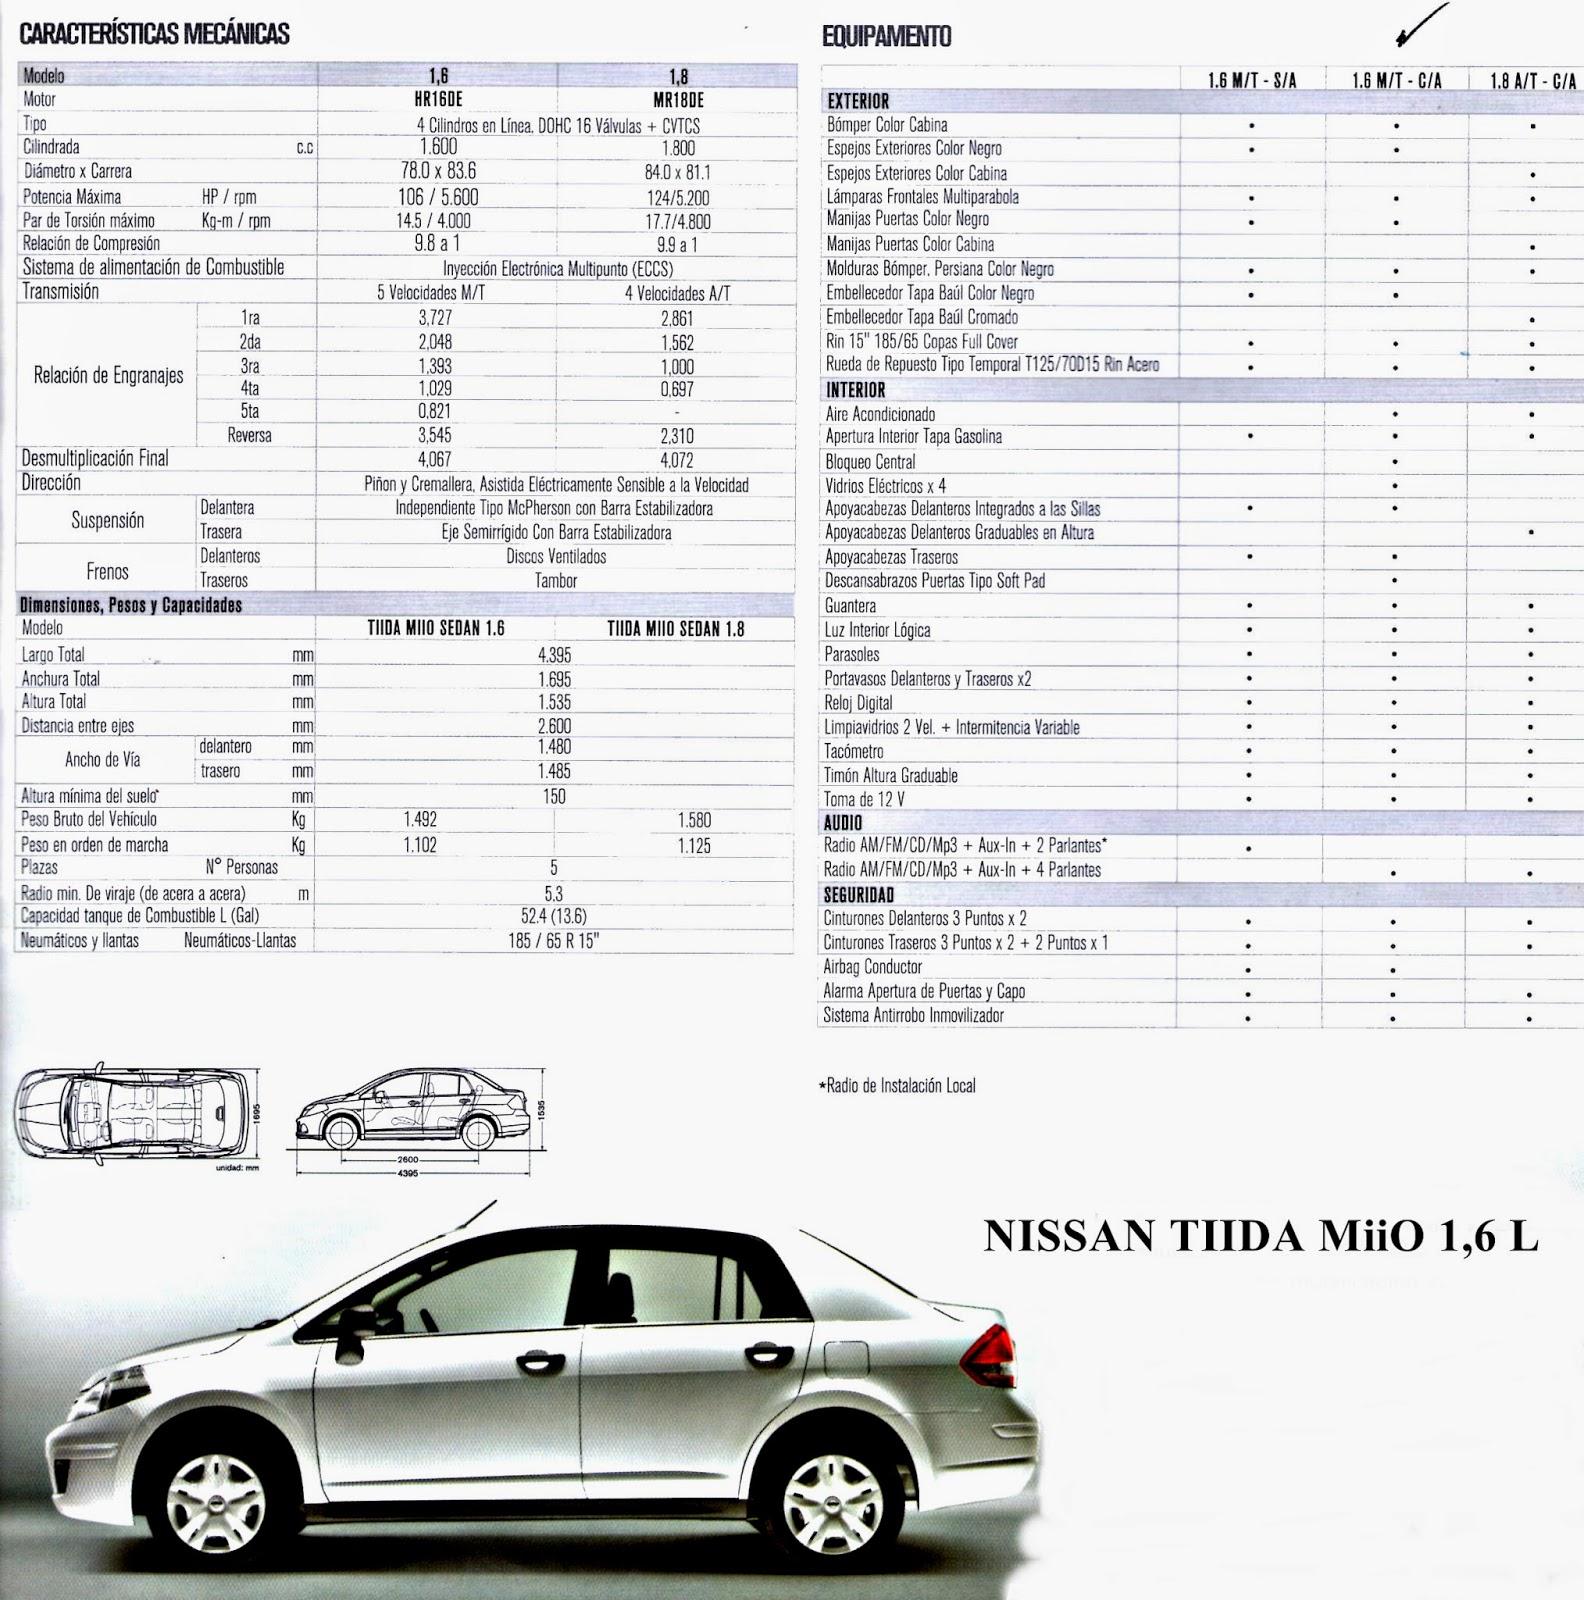 Ficha T 233 Cnica Nissan Tiida Miio 1 6 L